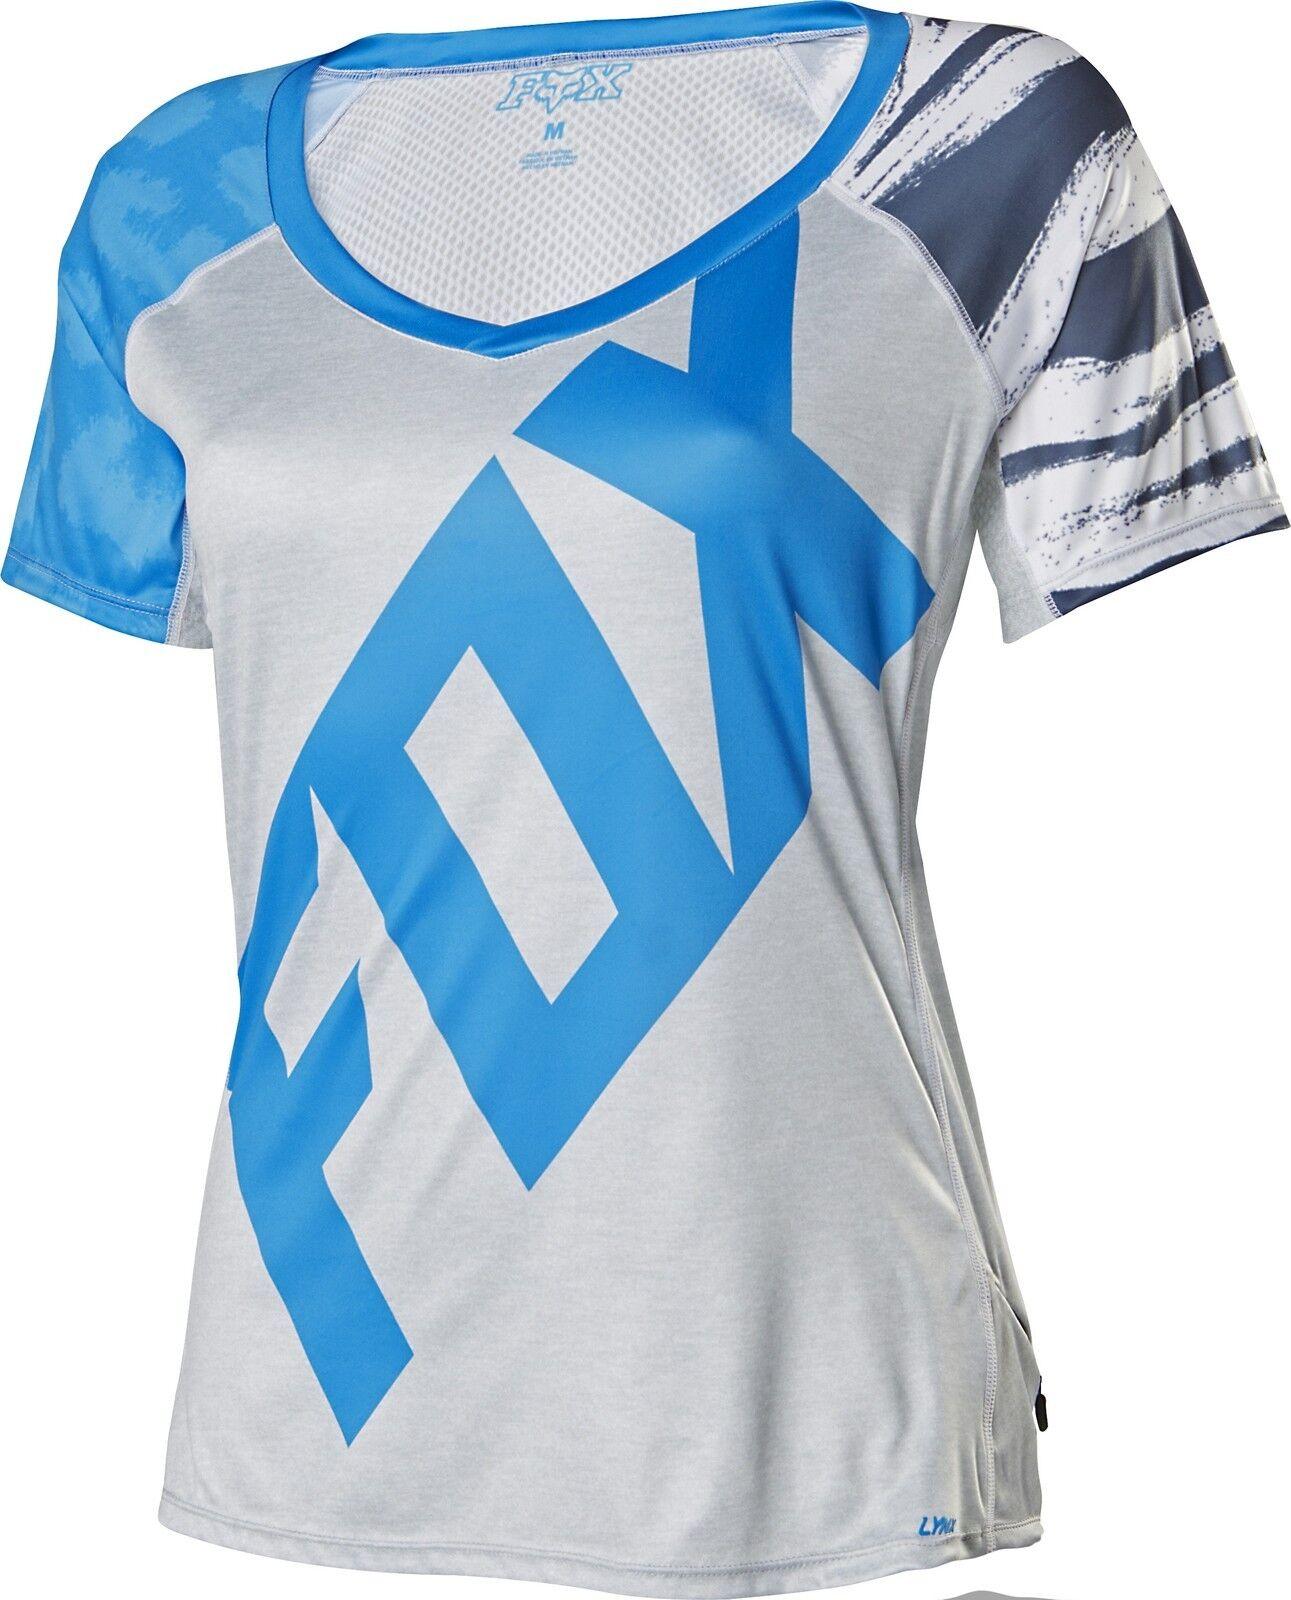 Fox Racing Womens Lynx  s s Jersey bluee Grey  hot sale online